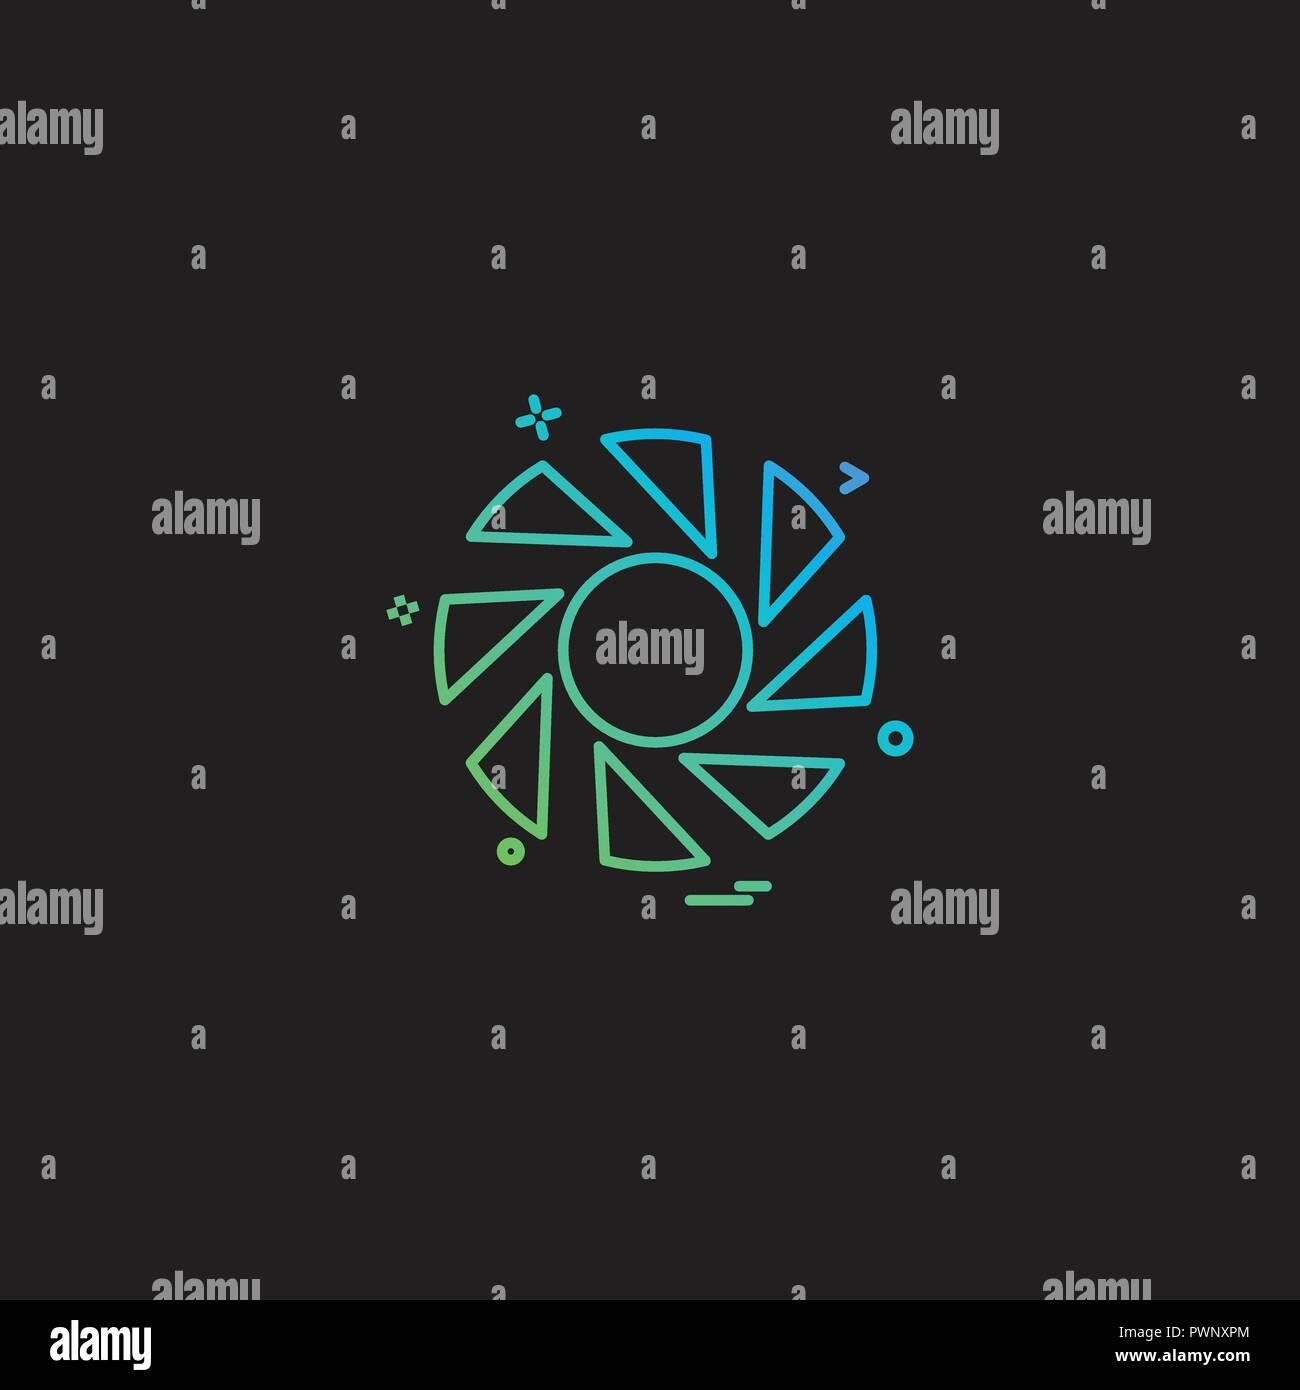 Shutter Icon Design Vector Stock Vector Art Illustration